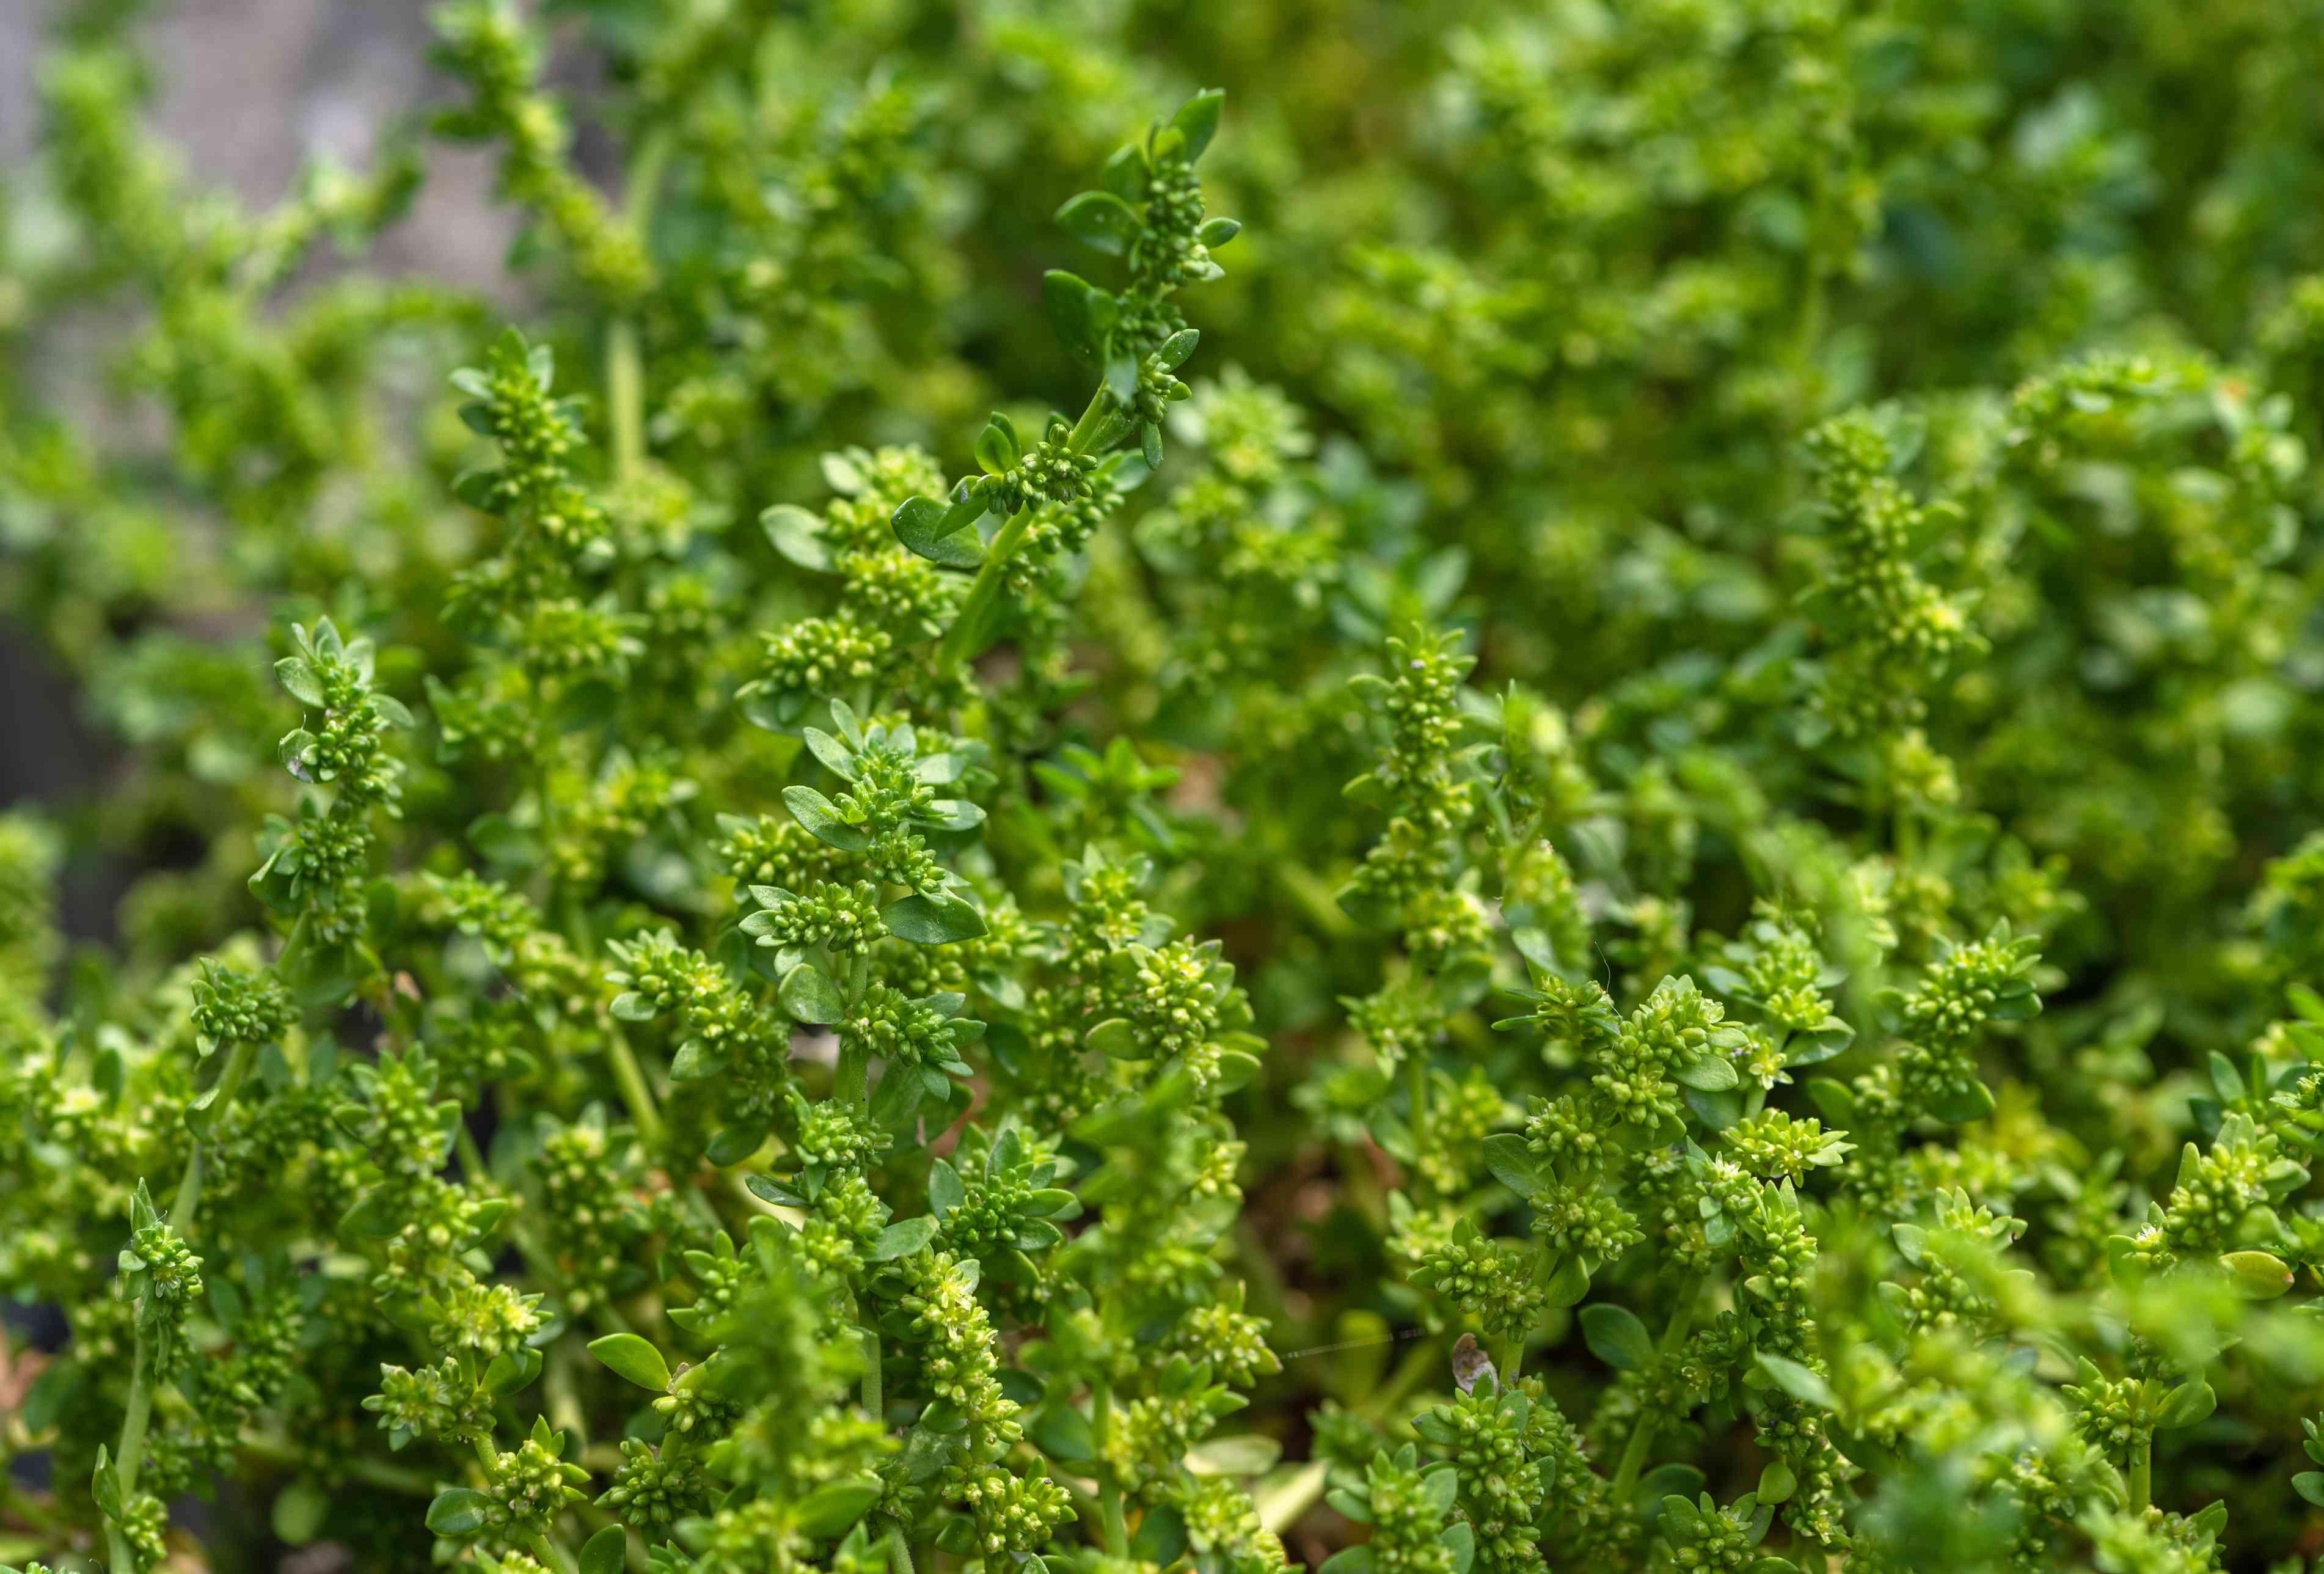 Rupturewort plant stems with dense evergreen leaves closeup